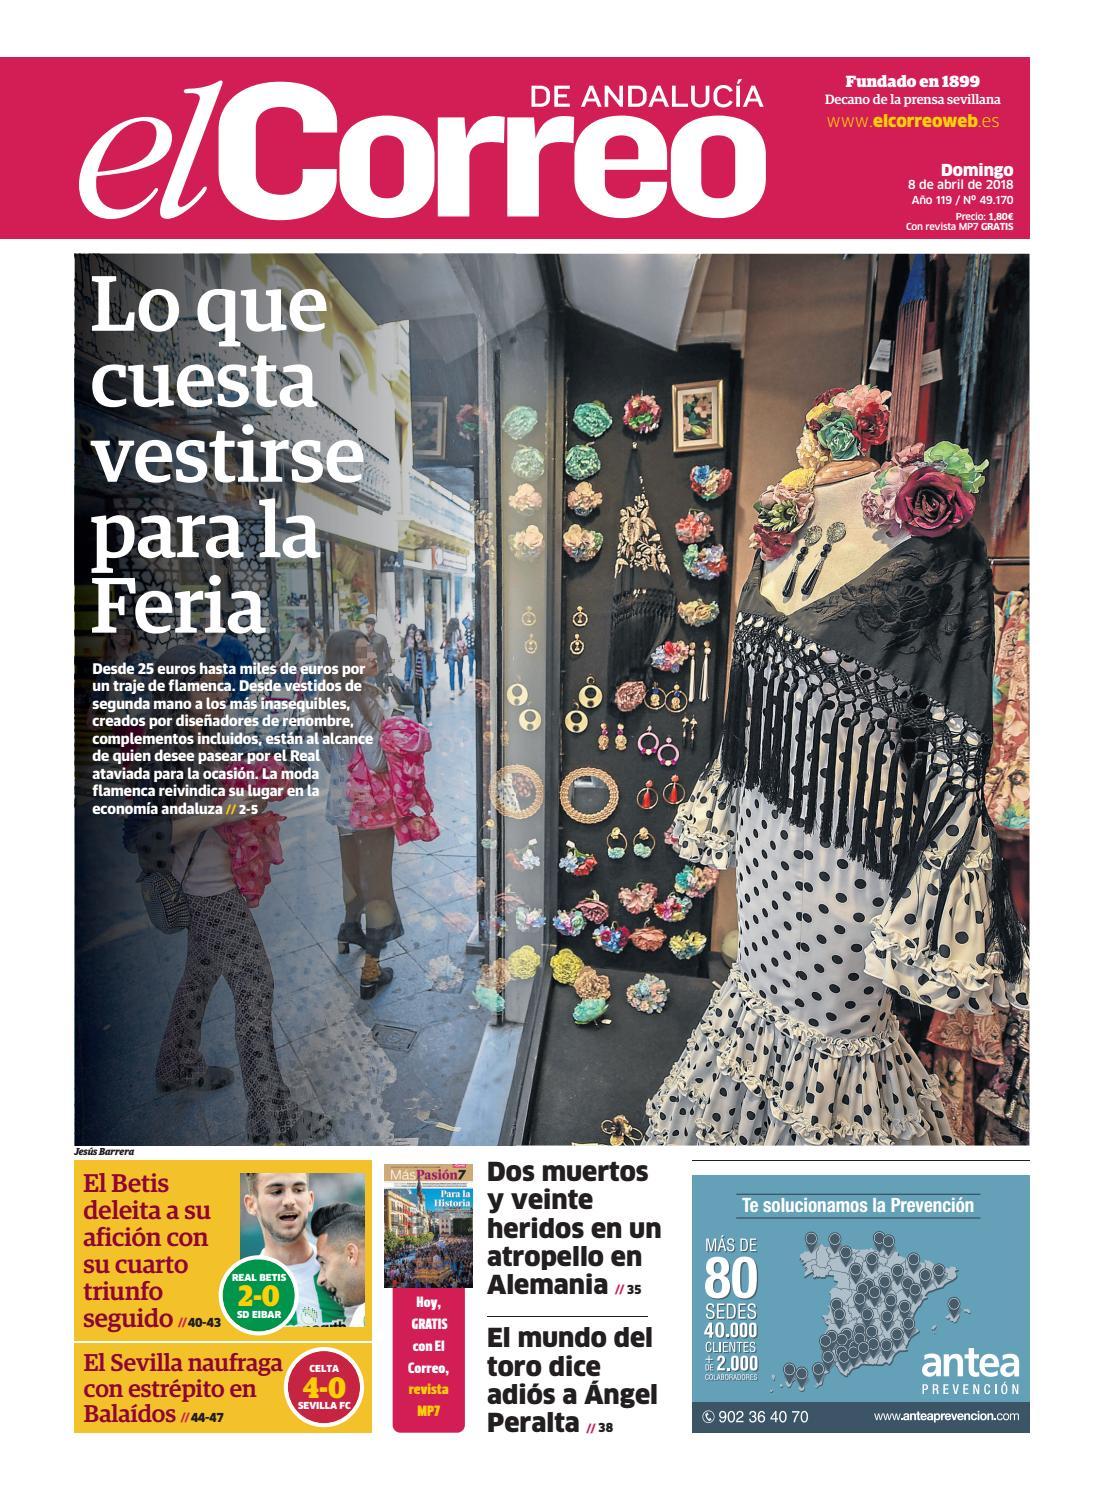 606735b4e5 08.04.2018 El Correo de Andalucía by EL CORREO DE ANDALUCÍA S.L. - issuu